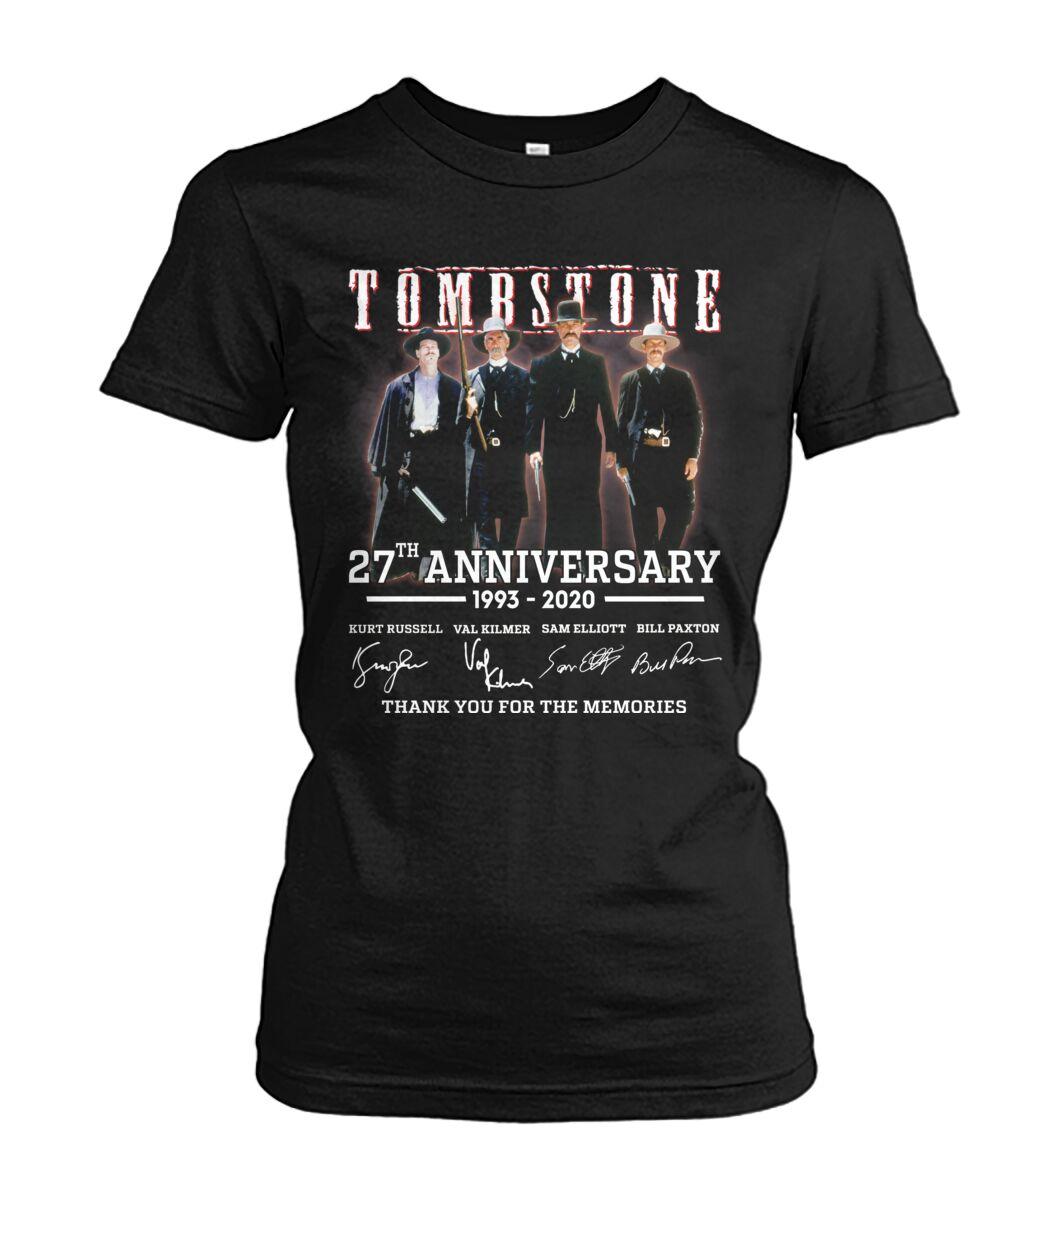 tombstone 27th anniversary signature shirt